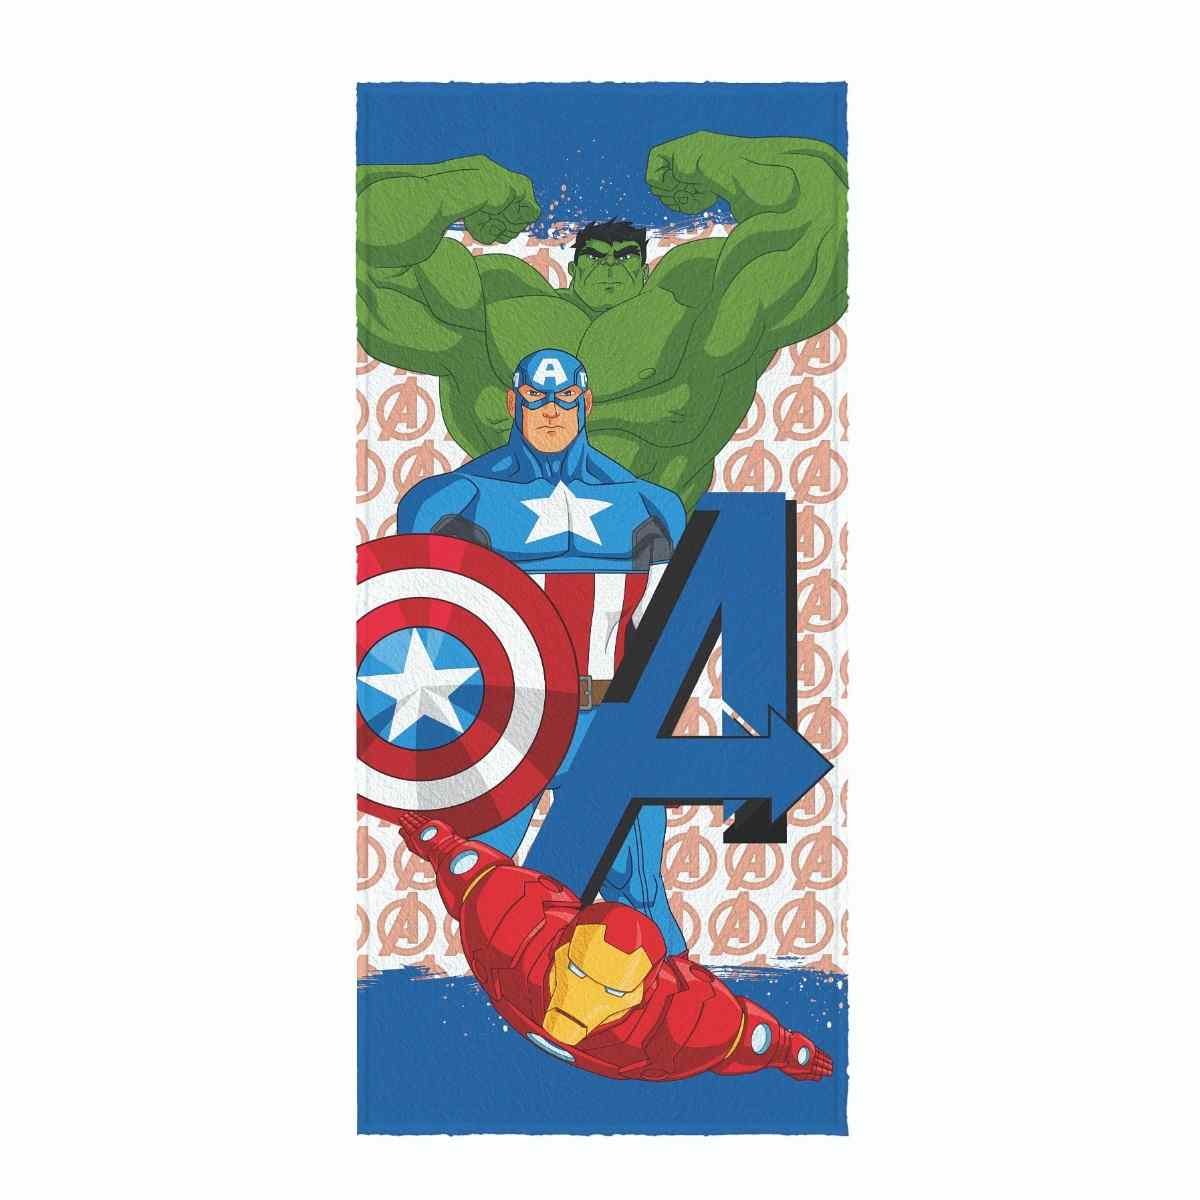 Toalha banho infantil felpuda 60x120 Avengers Est 4